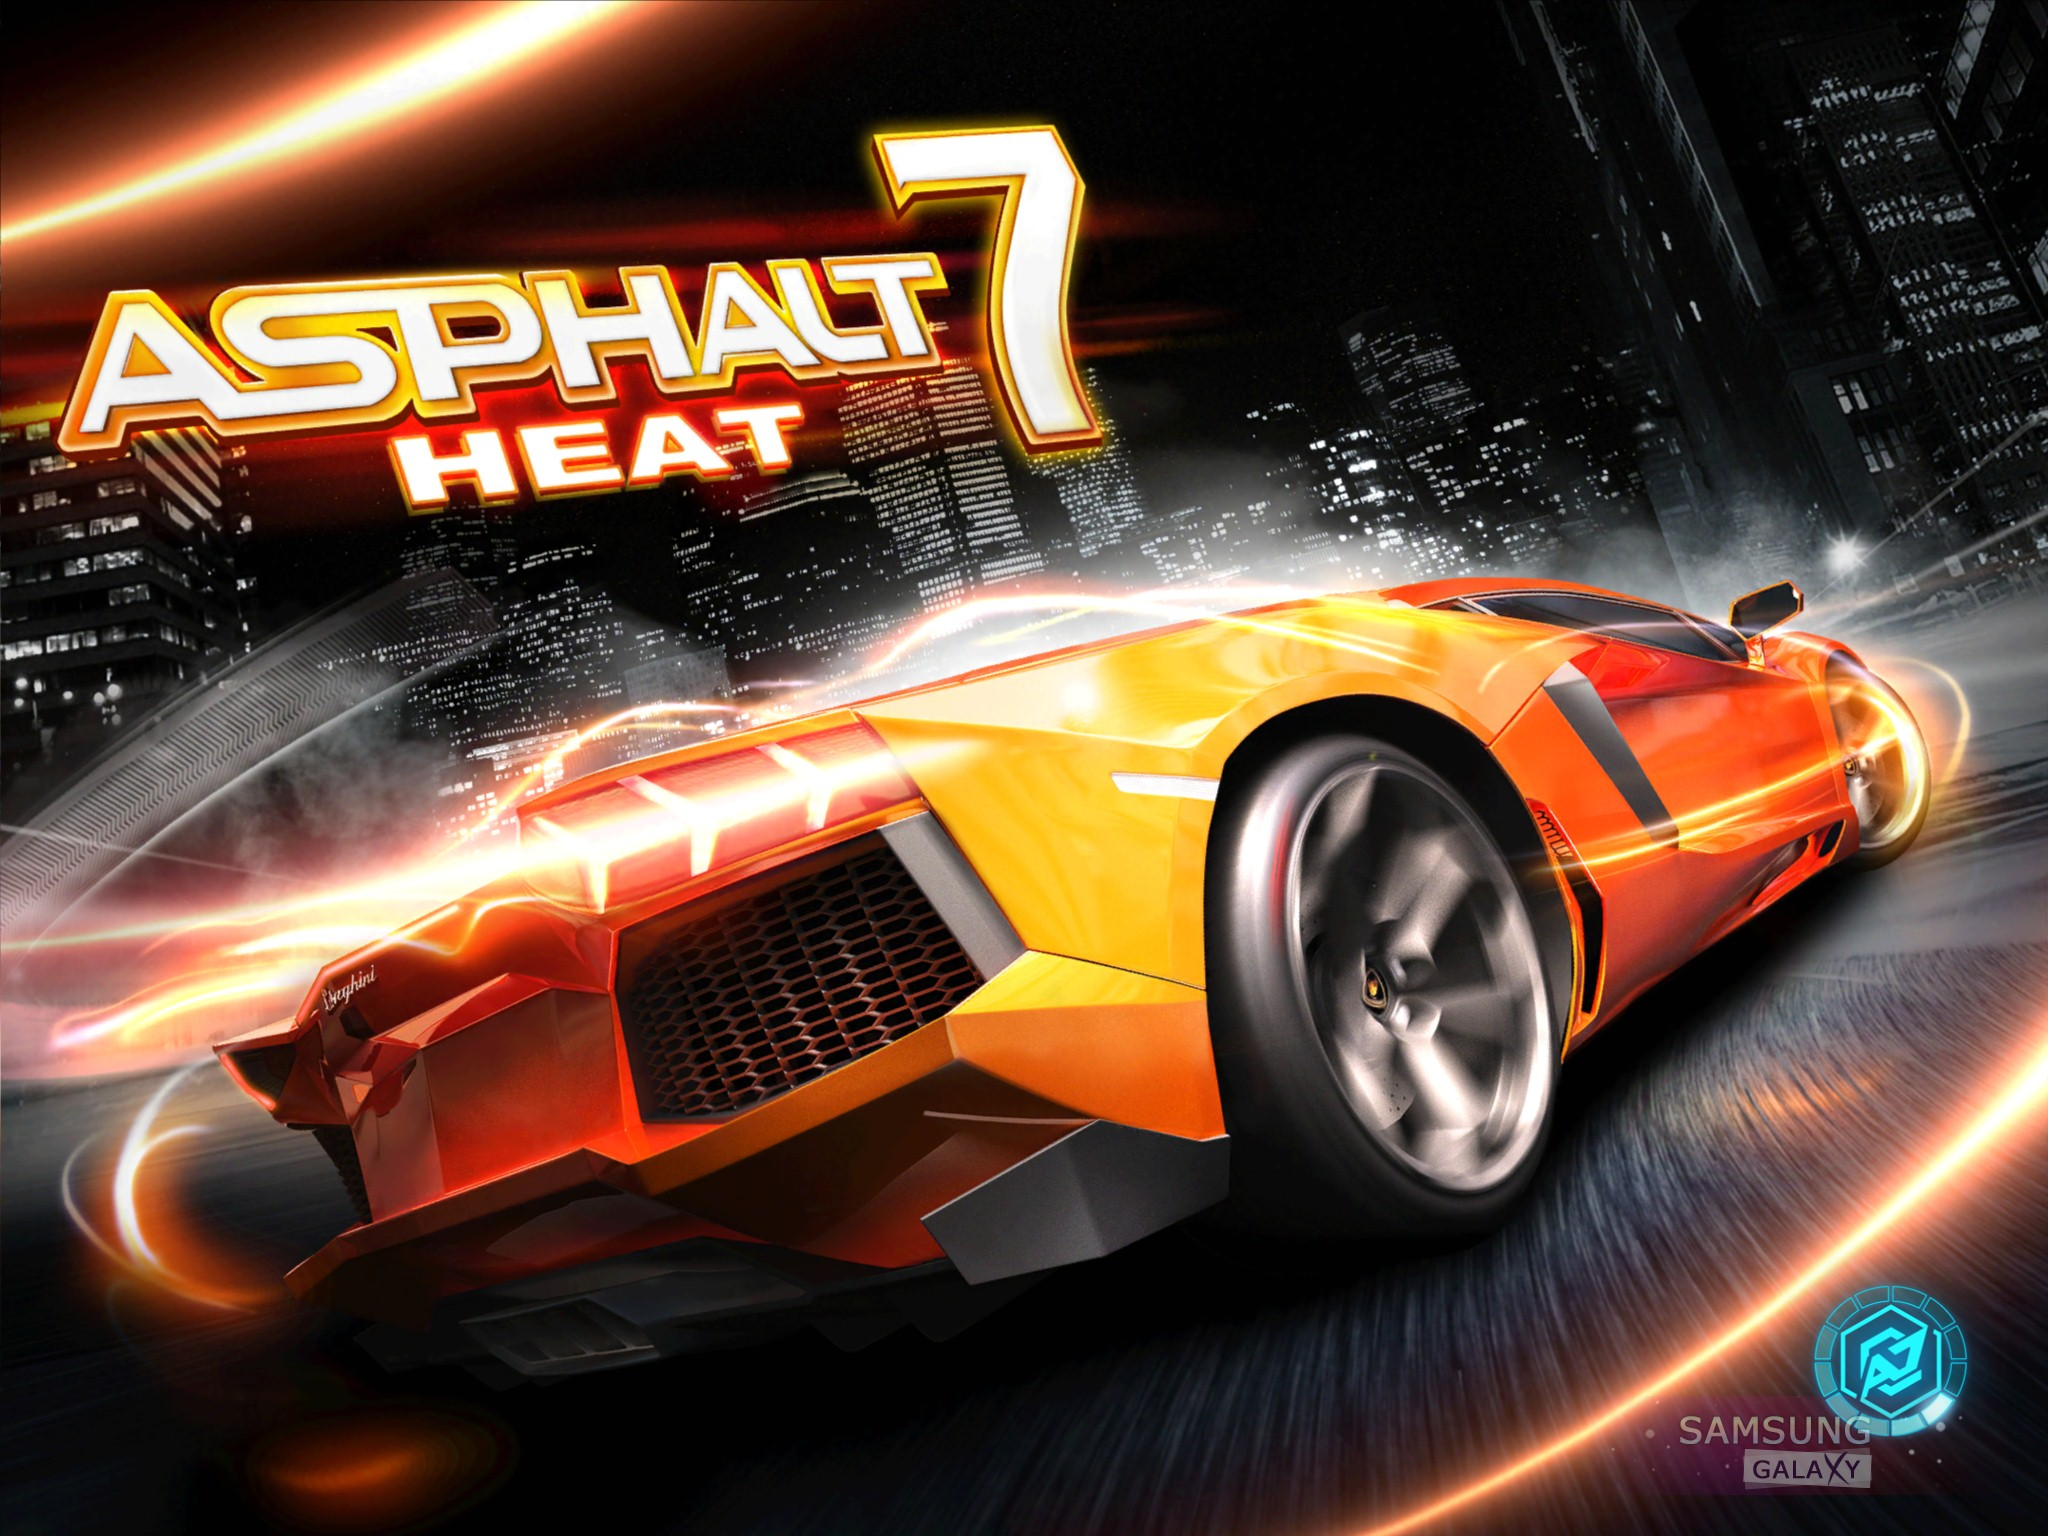 Asphalt 7 Heat для Samusng Galaxy Note, S III, Ace, S 2, Gio